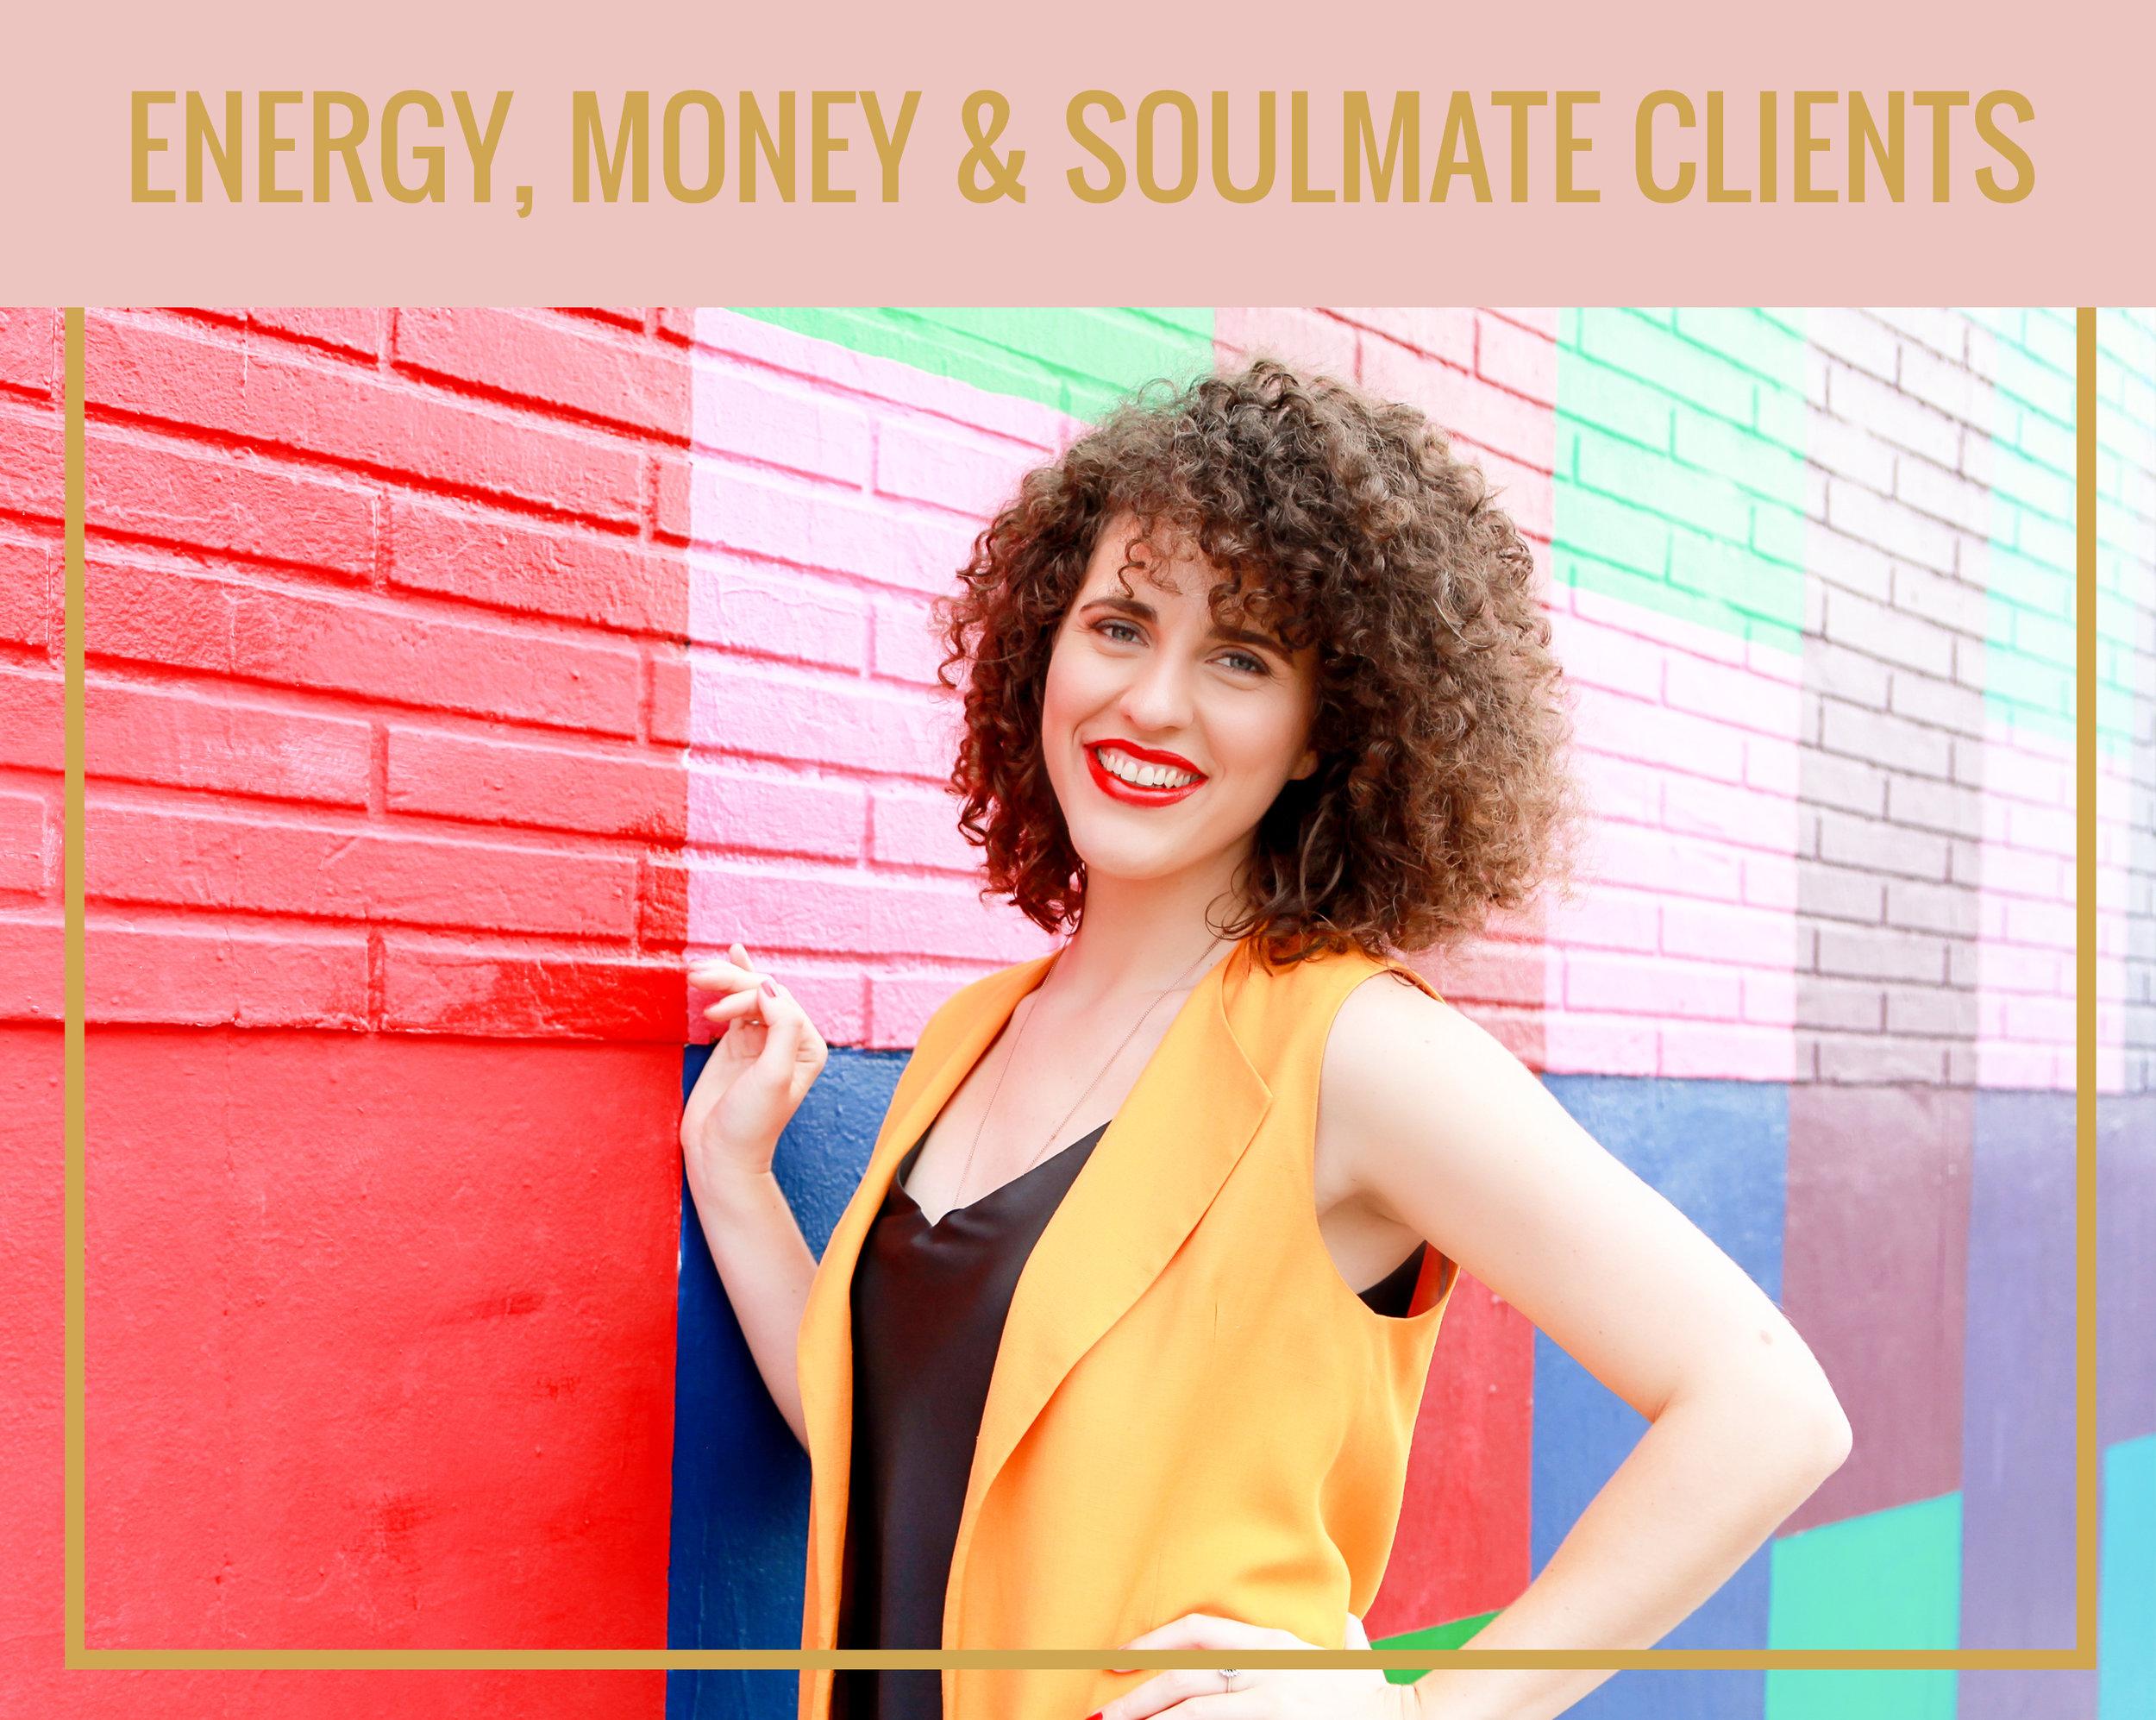 ENERGY,-MONEY-&-SOULMATE-CLIENTS (3).jpg